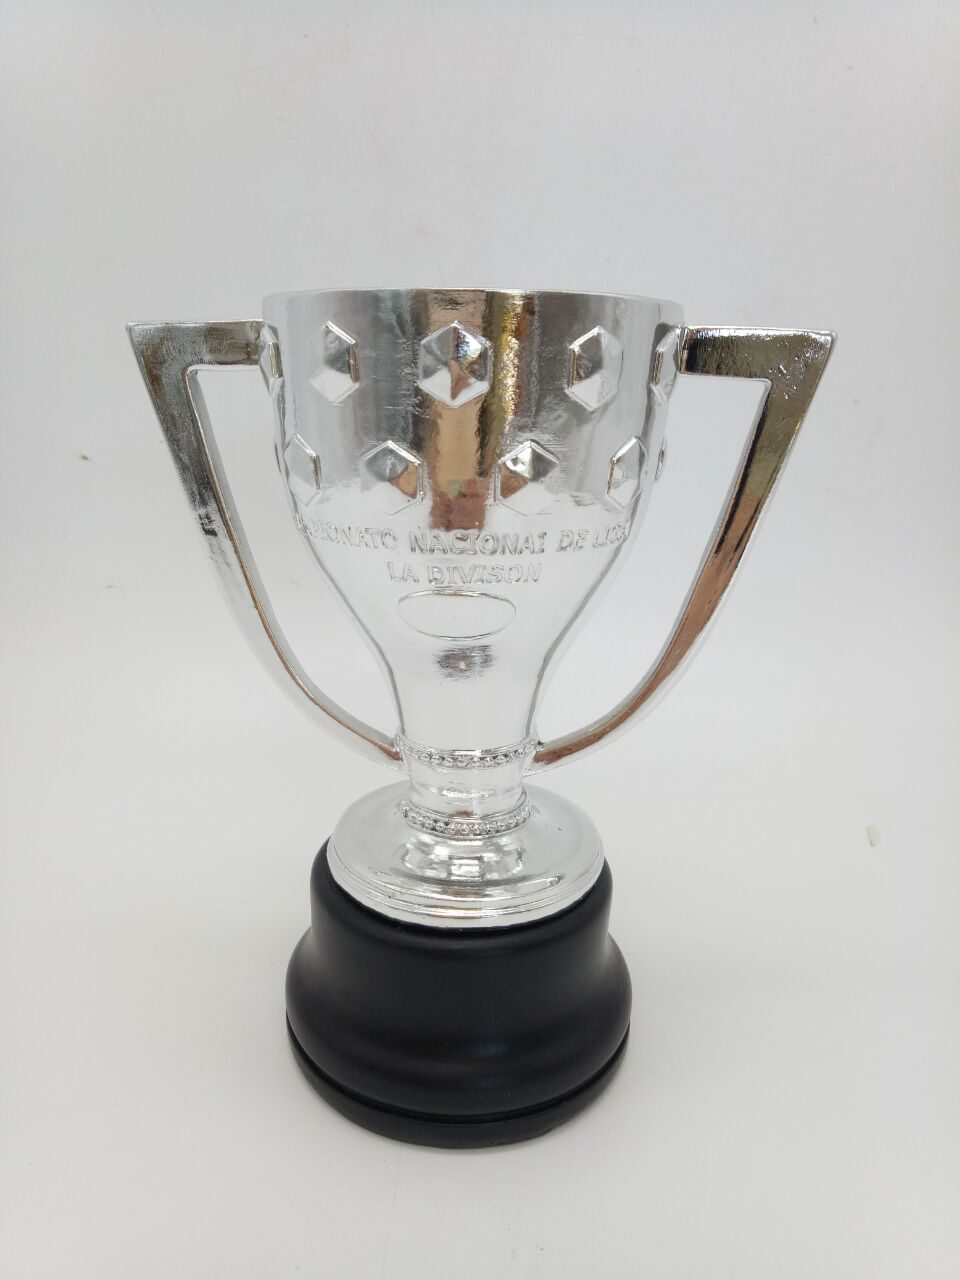 high quality custom Prize Award La Liga Trophies and Awards   football Trophies   Award Medals